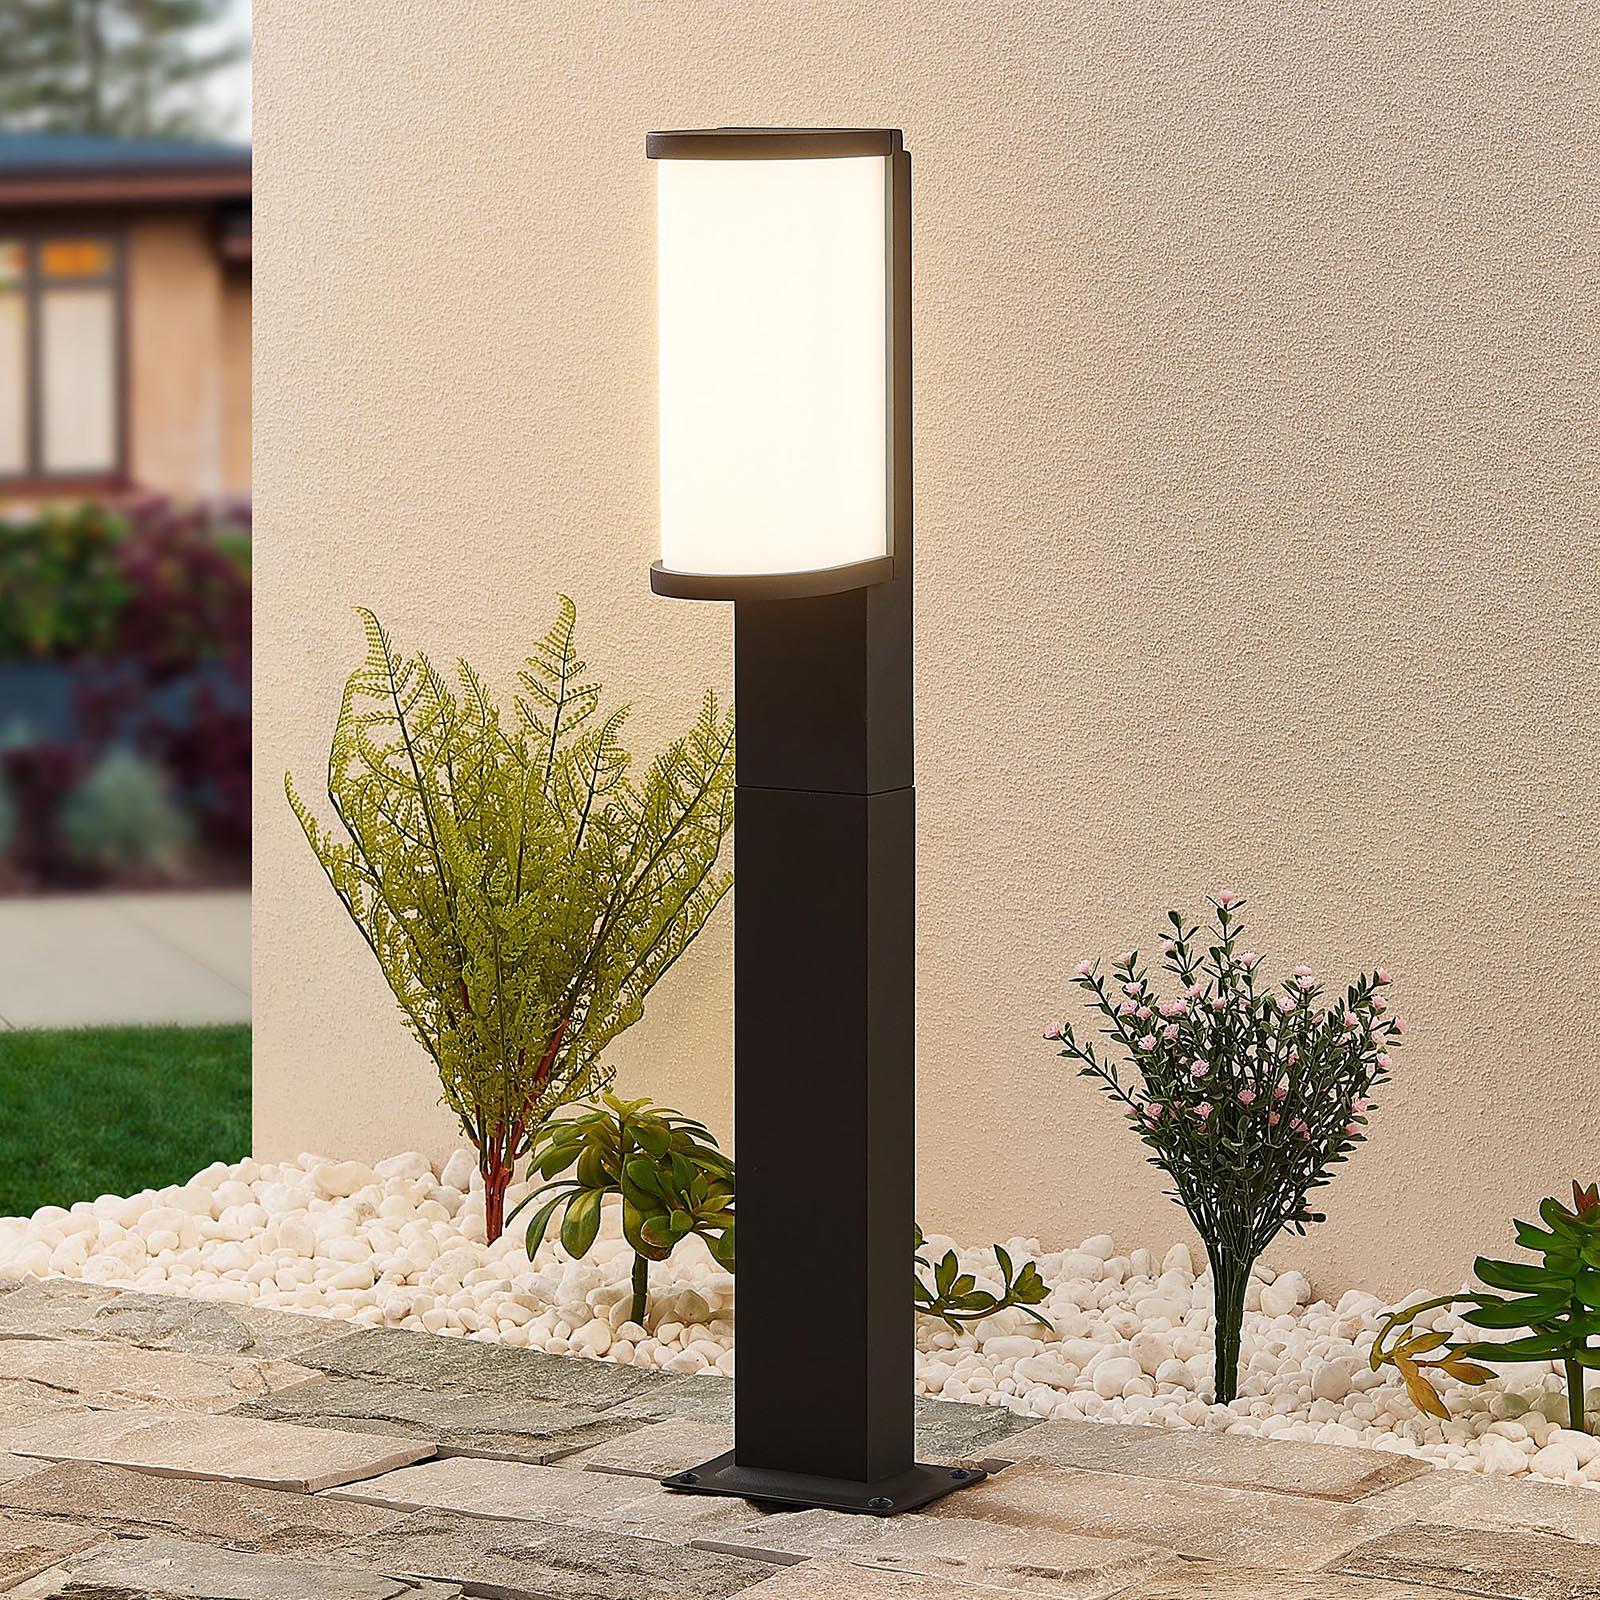 Lucande Jokum LED-Wegelampe, IP65, 60 cm